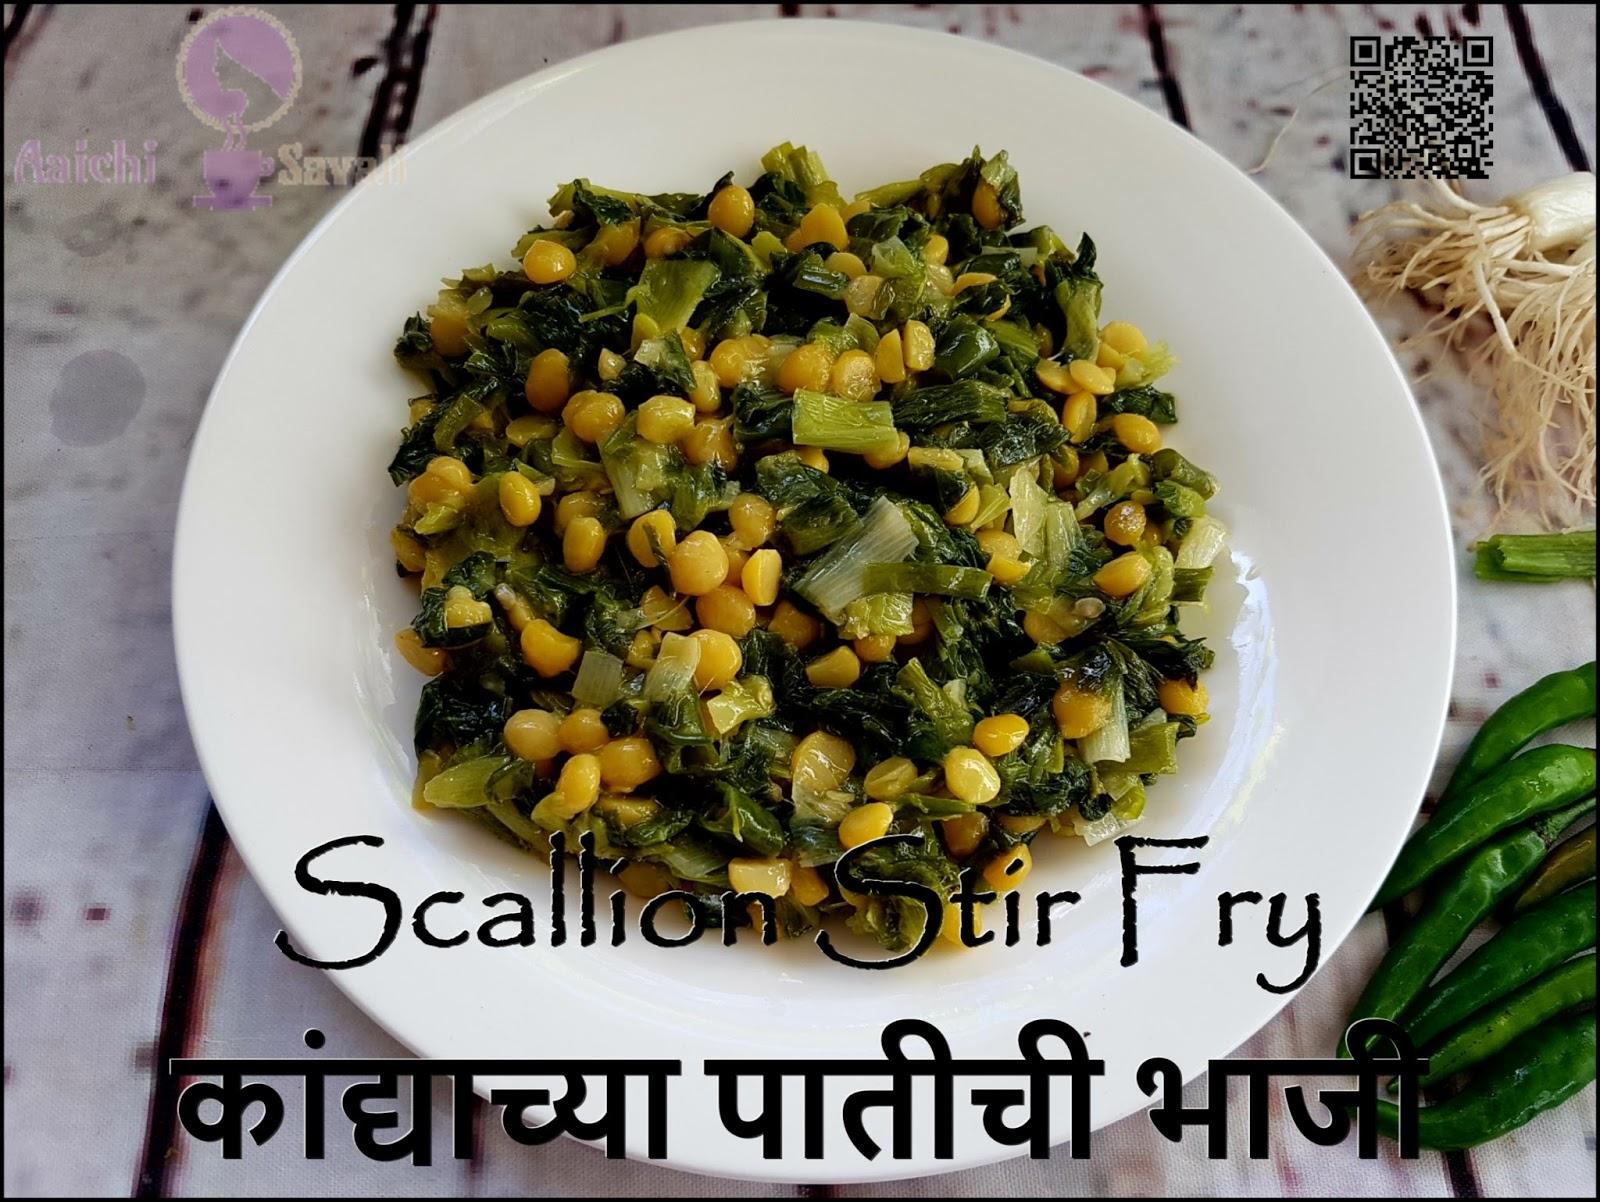 Spring Onions Fry Kandyachya Patichi Bhaji Scallion Fry À¤• À¤¦ À¤¯ À¤š À¤¯ À¤ª À¤¤ À¤š À¤ À¤œ Aaichi Savali